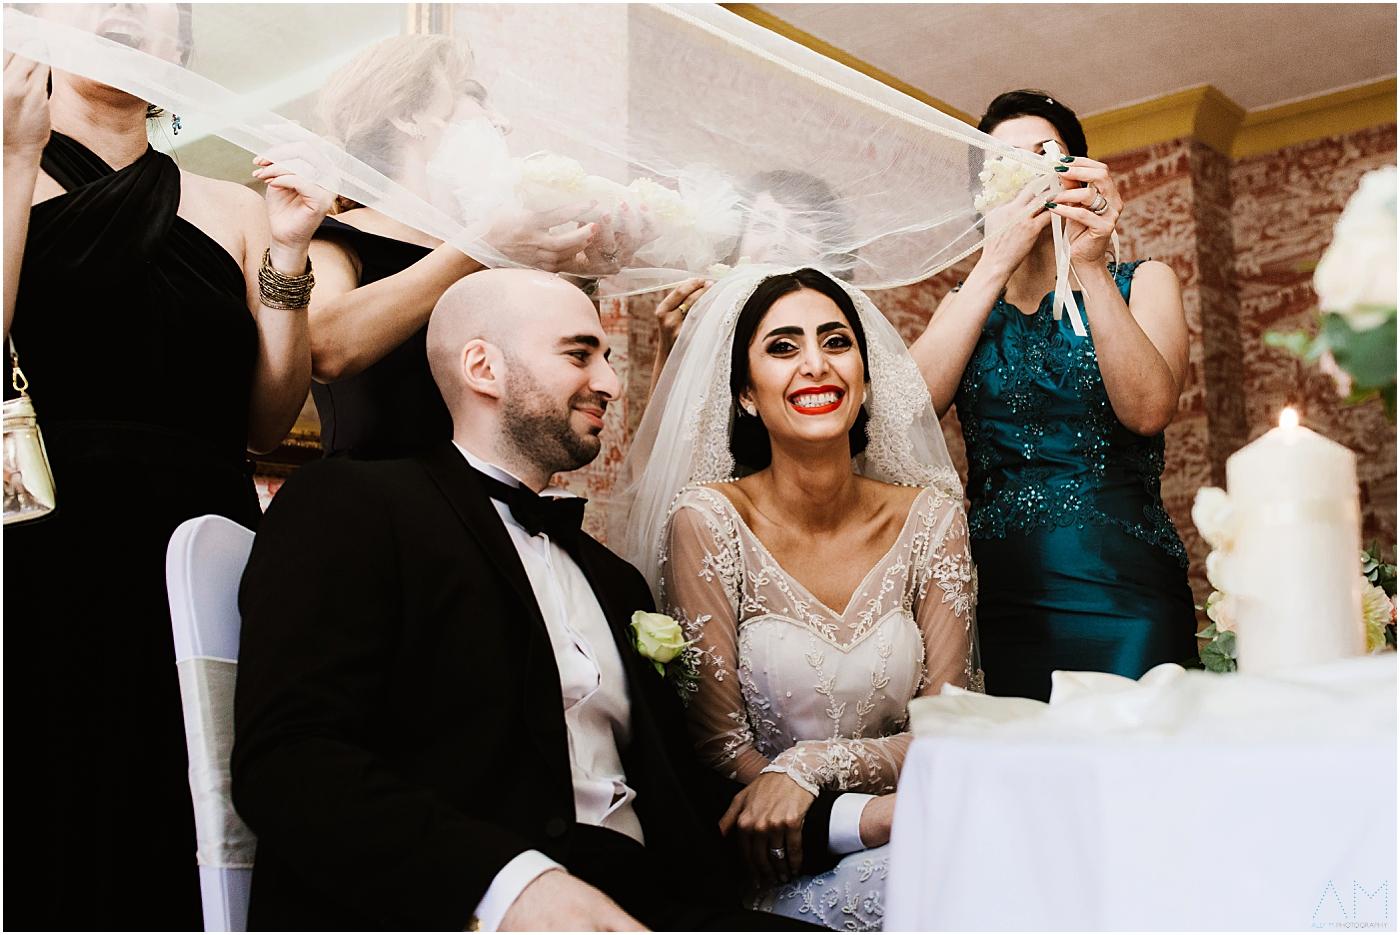 iranaian wedding photography